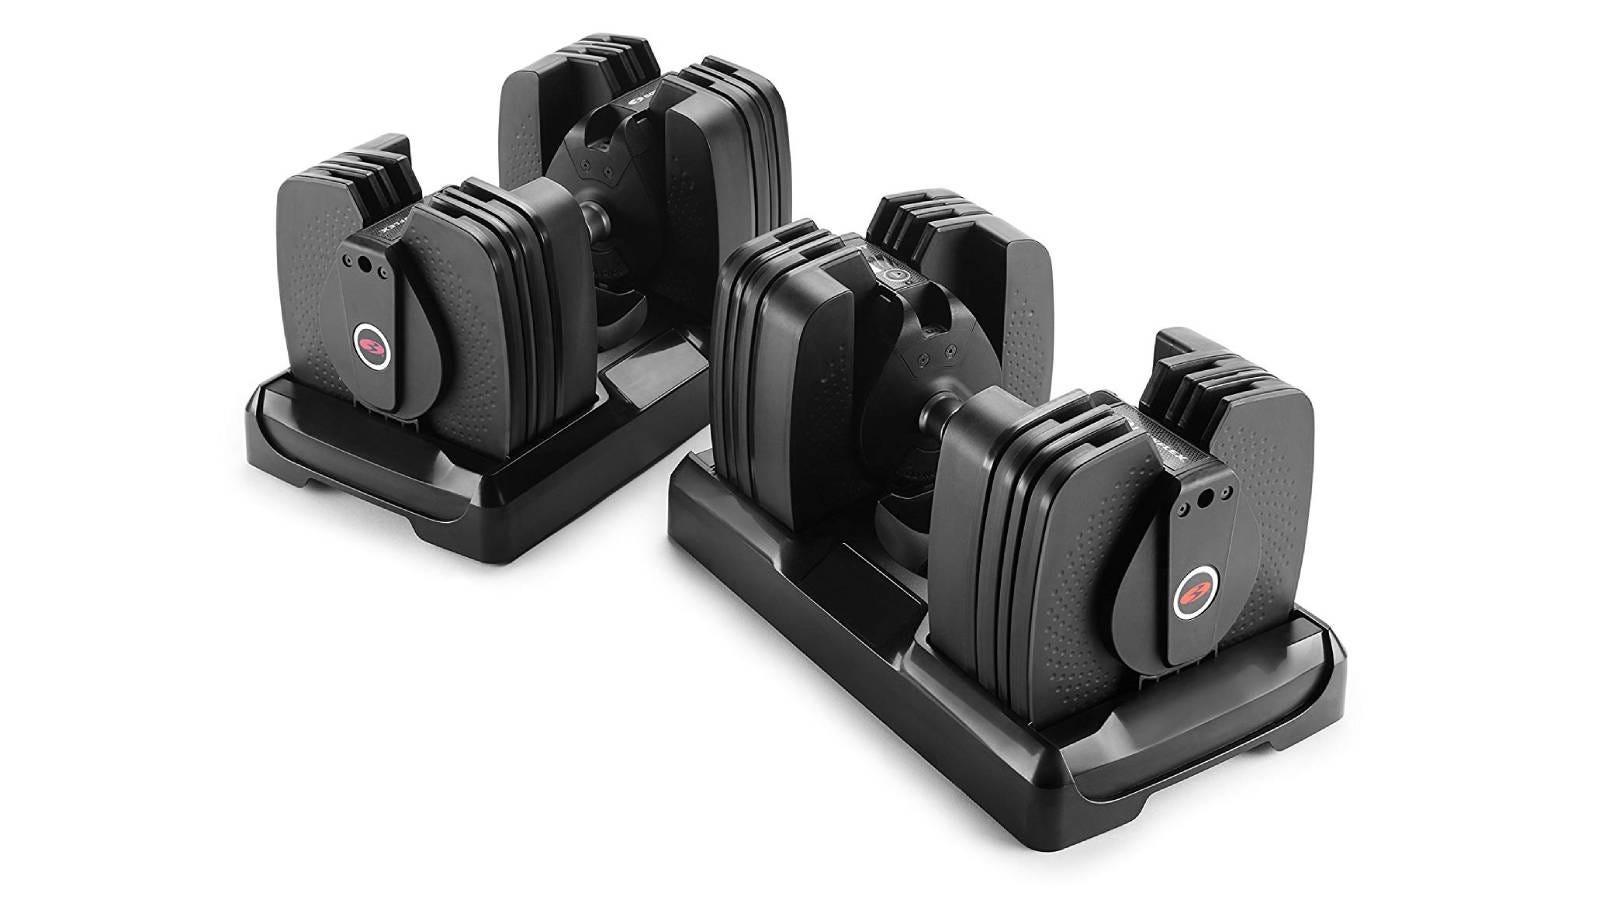 The Bowflex SelectTech 560 Dumbbells.